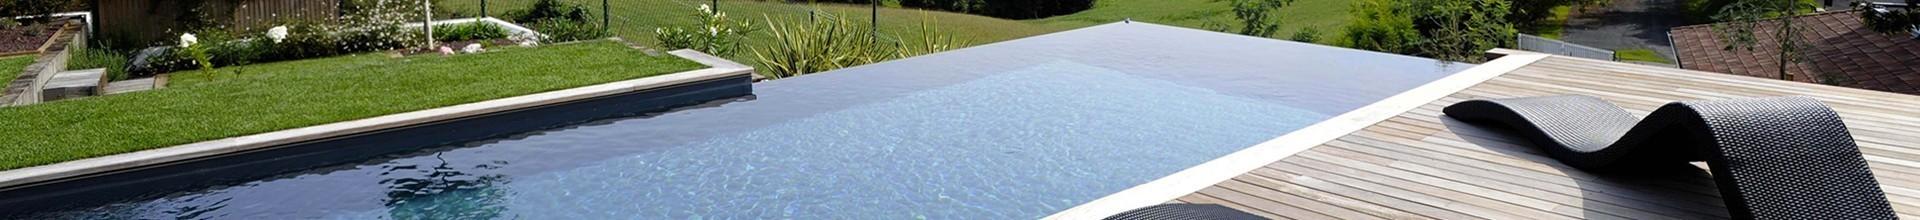 Constructeur piscine discount Pays : Suisse